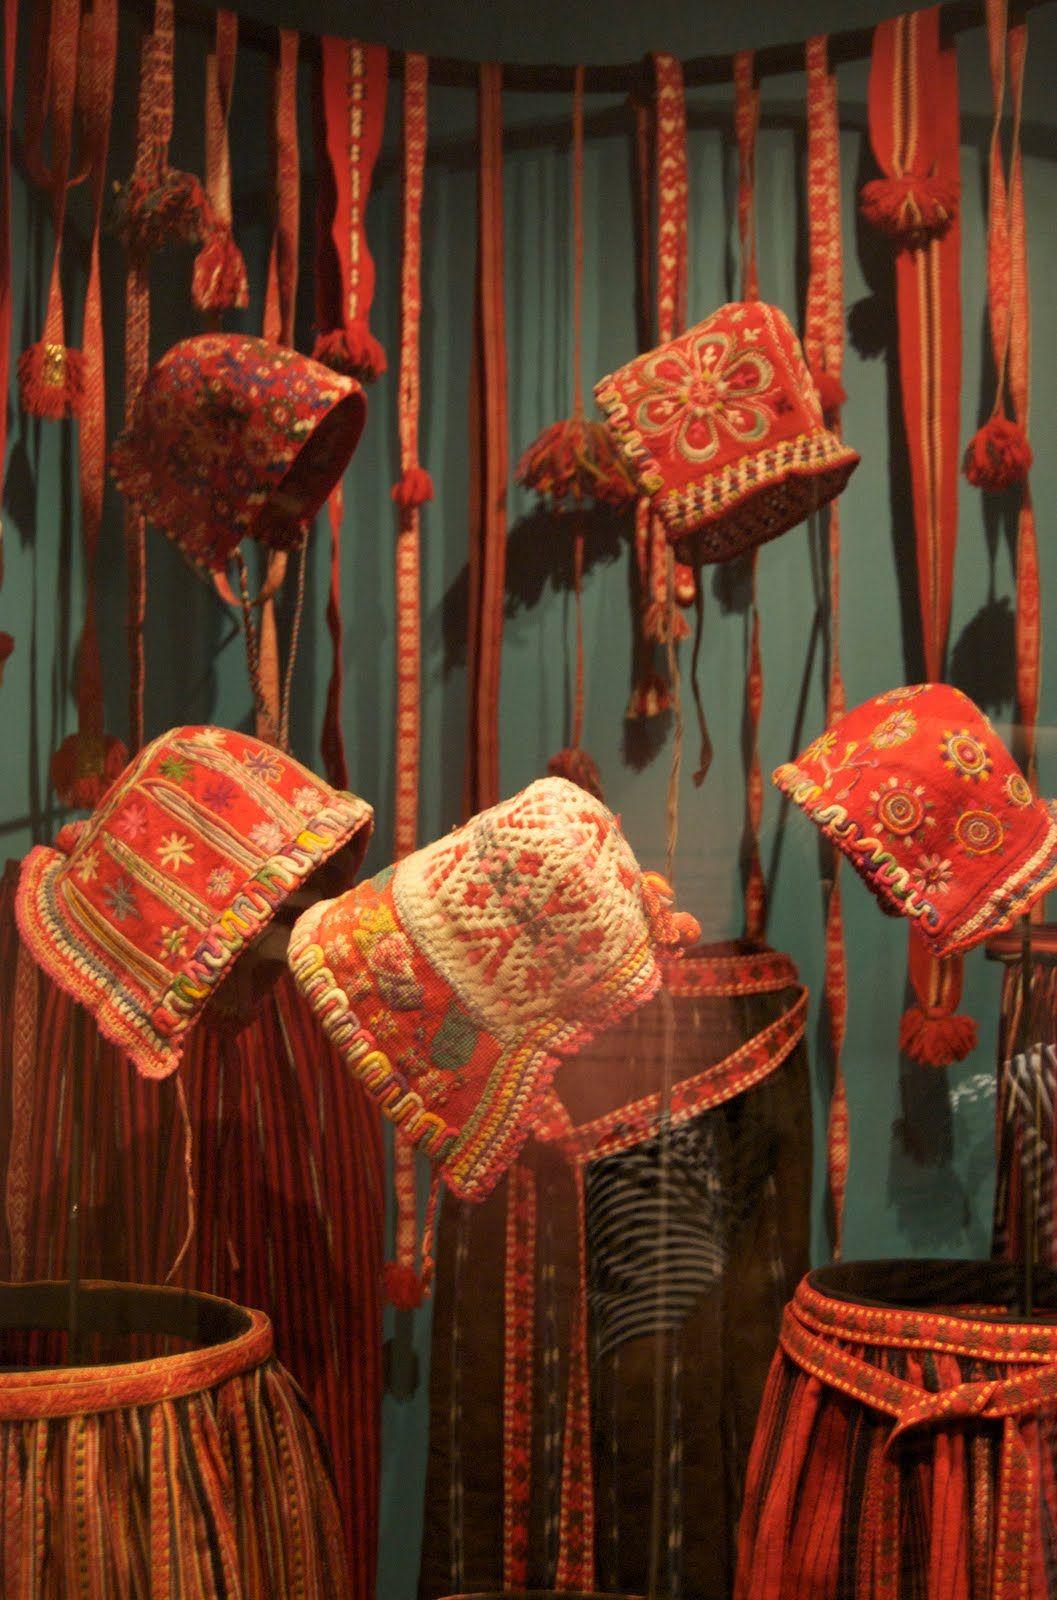 Swedish traditional bonnets for folk dresses